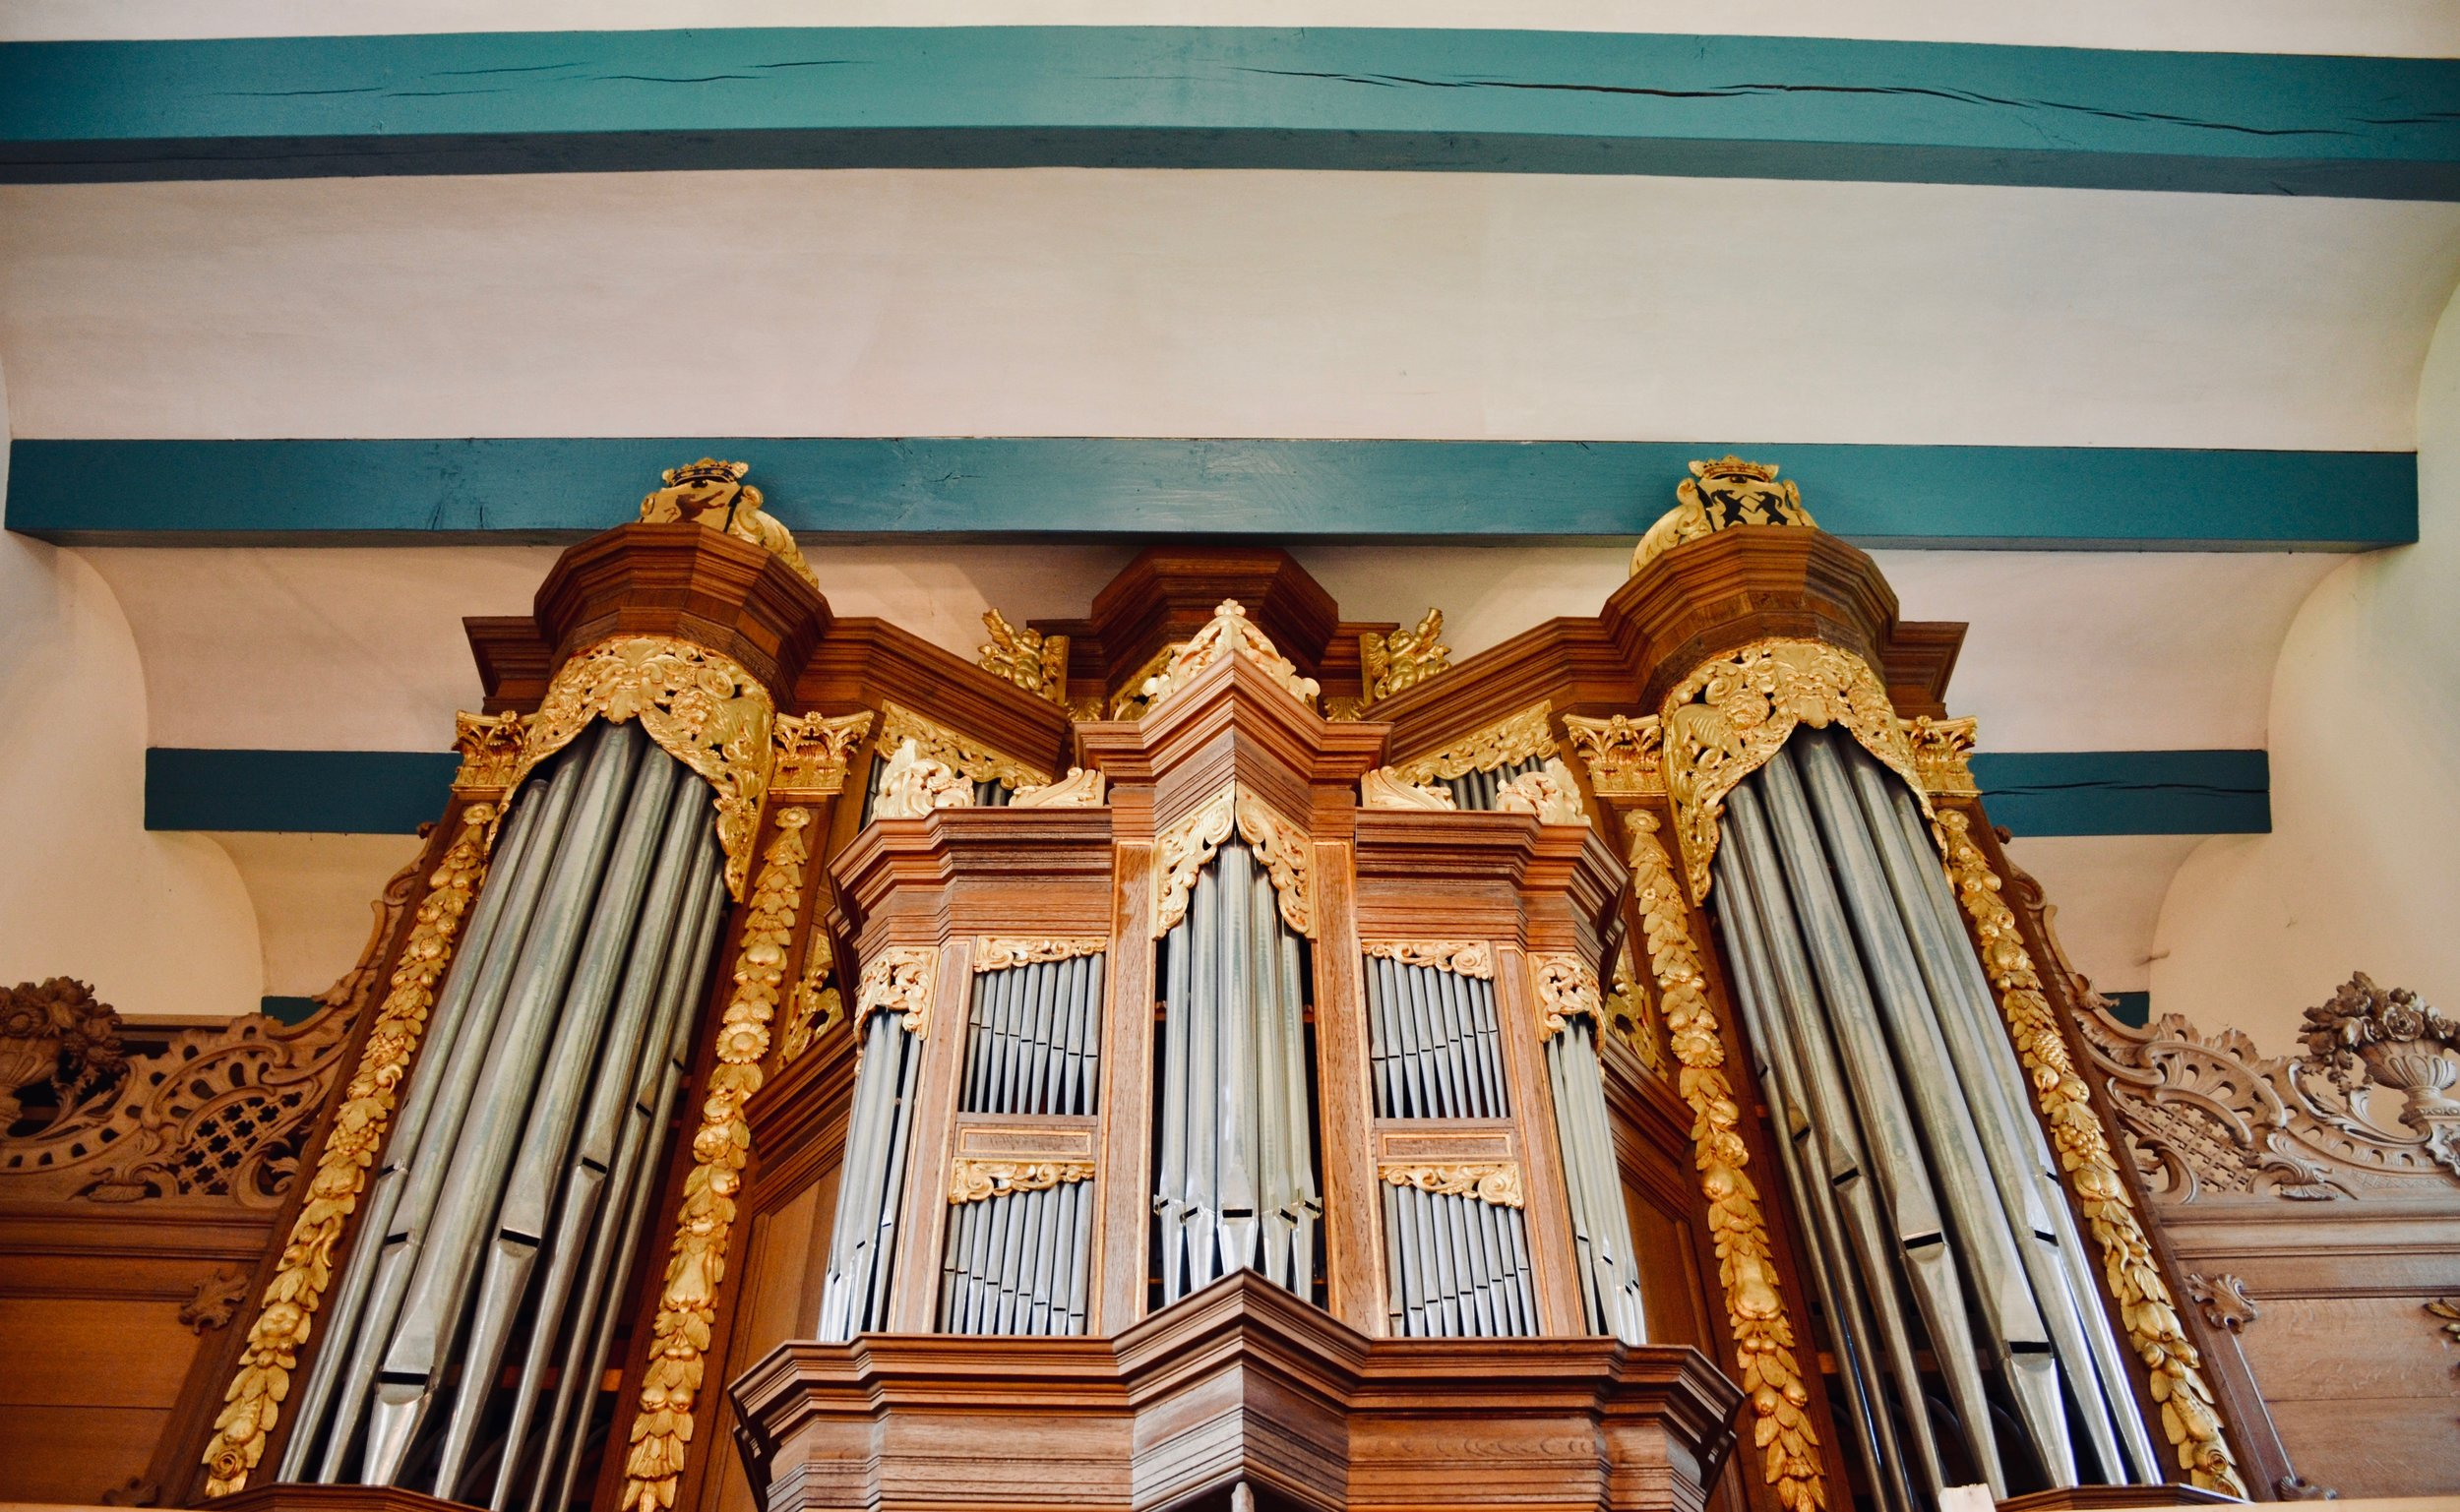 1667 Huis organ, Kantens, Holland.